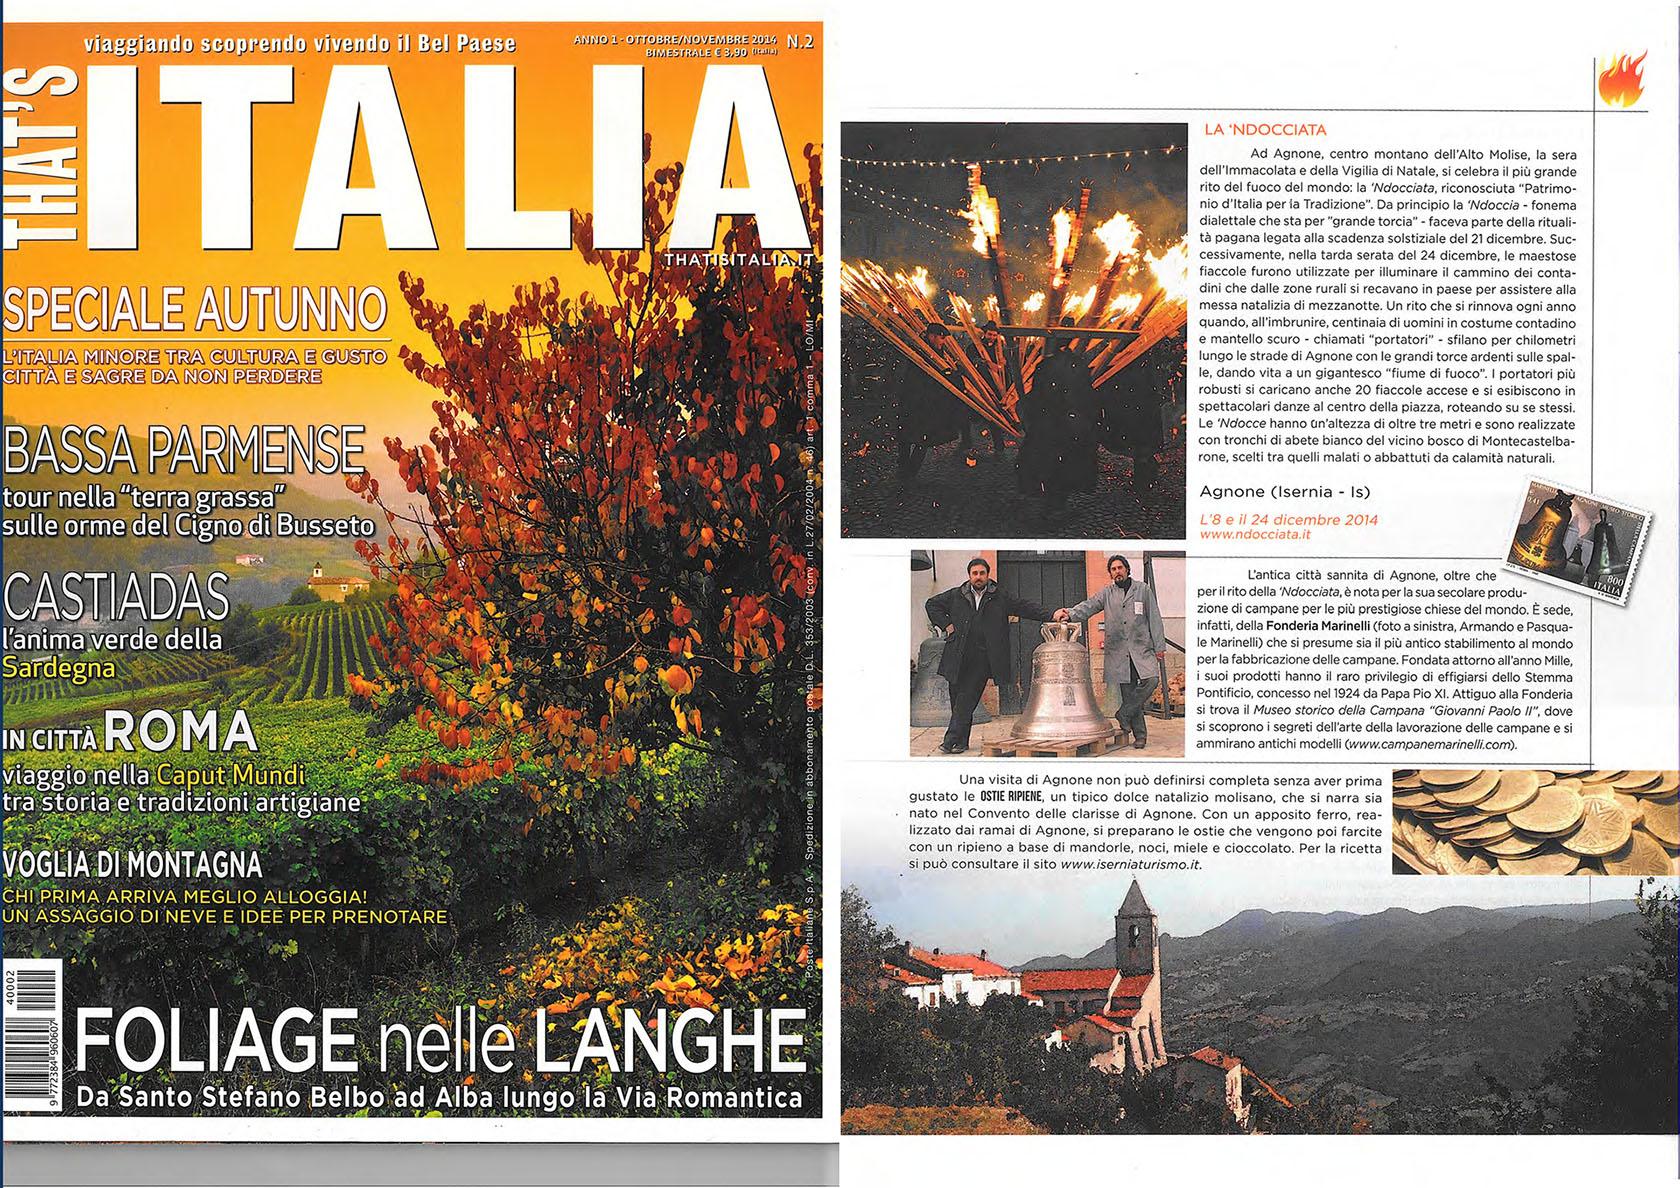 Thath's Italia - Fonderia Marinelli